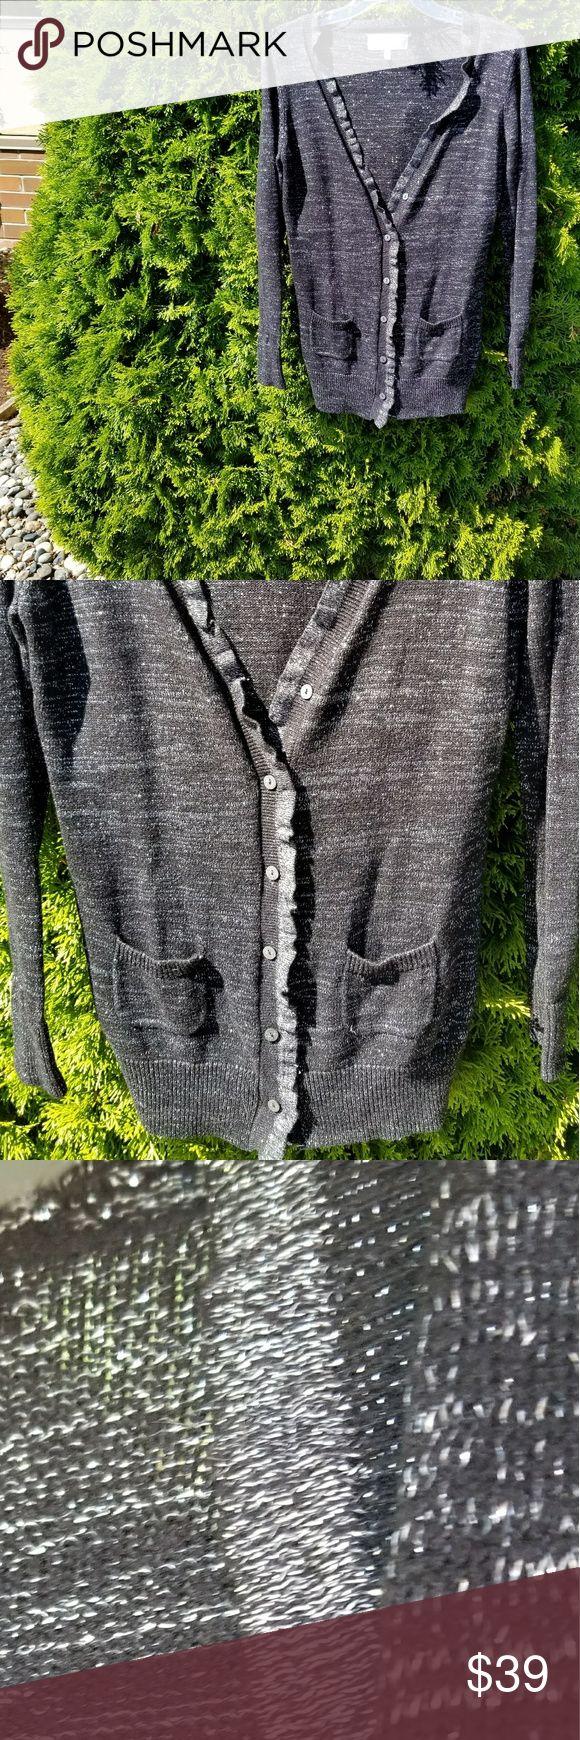 Victoria's Secret Metallic Cardigan In very good condition. PINK Victoria's Secret Sweaters Cardigans